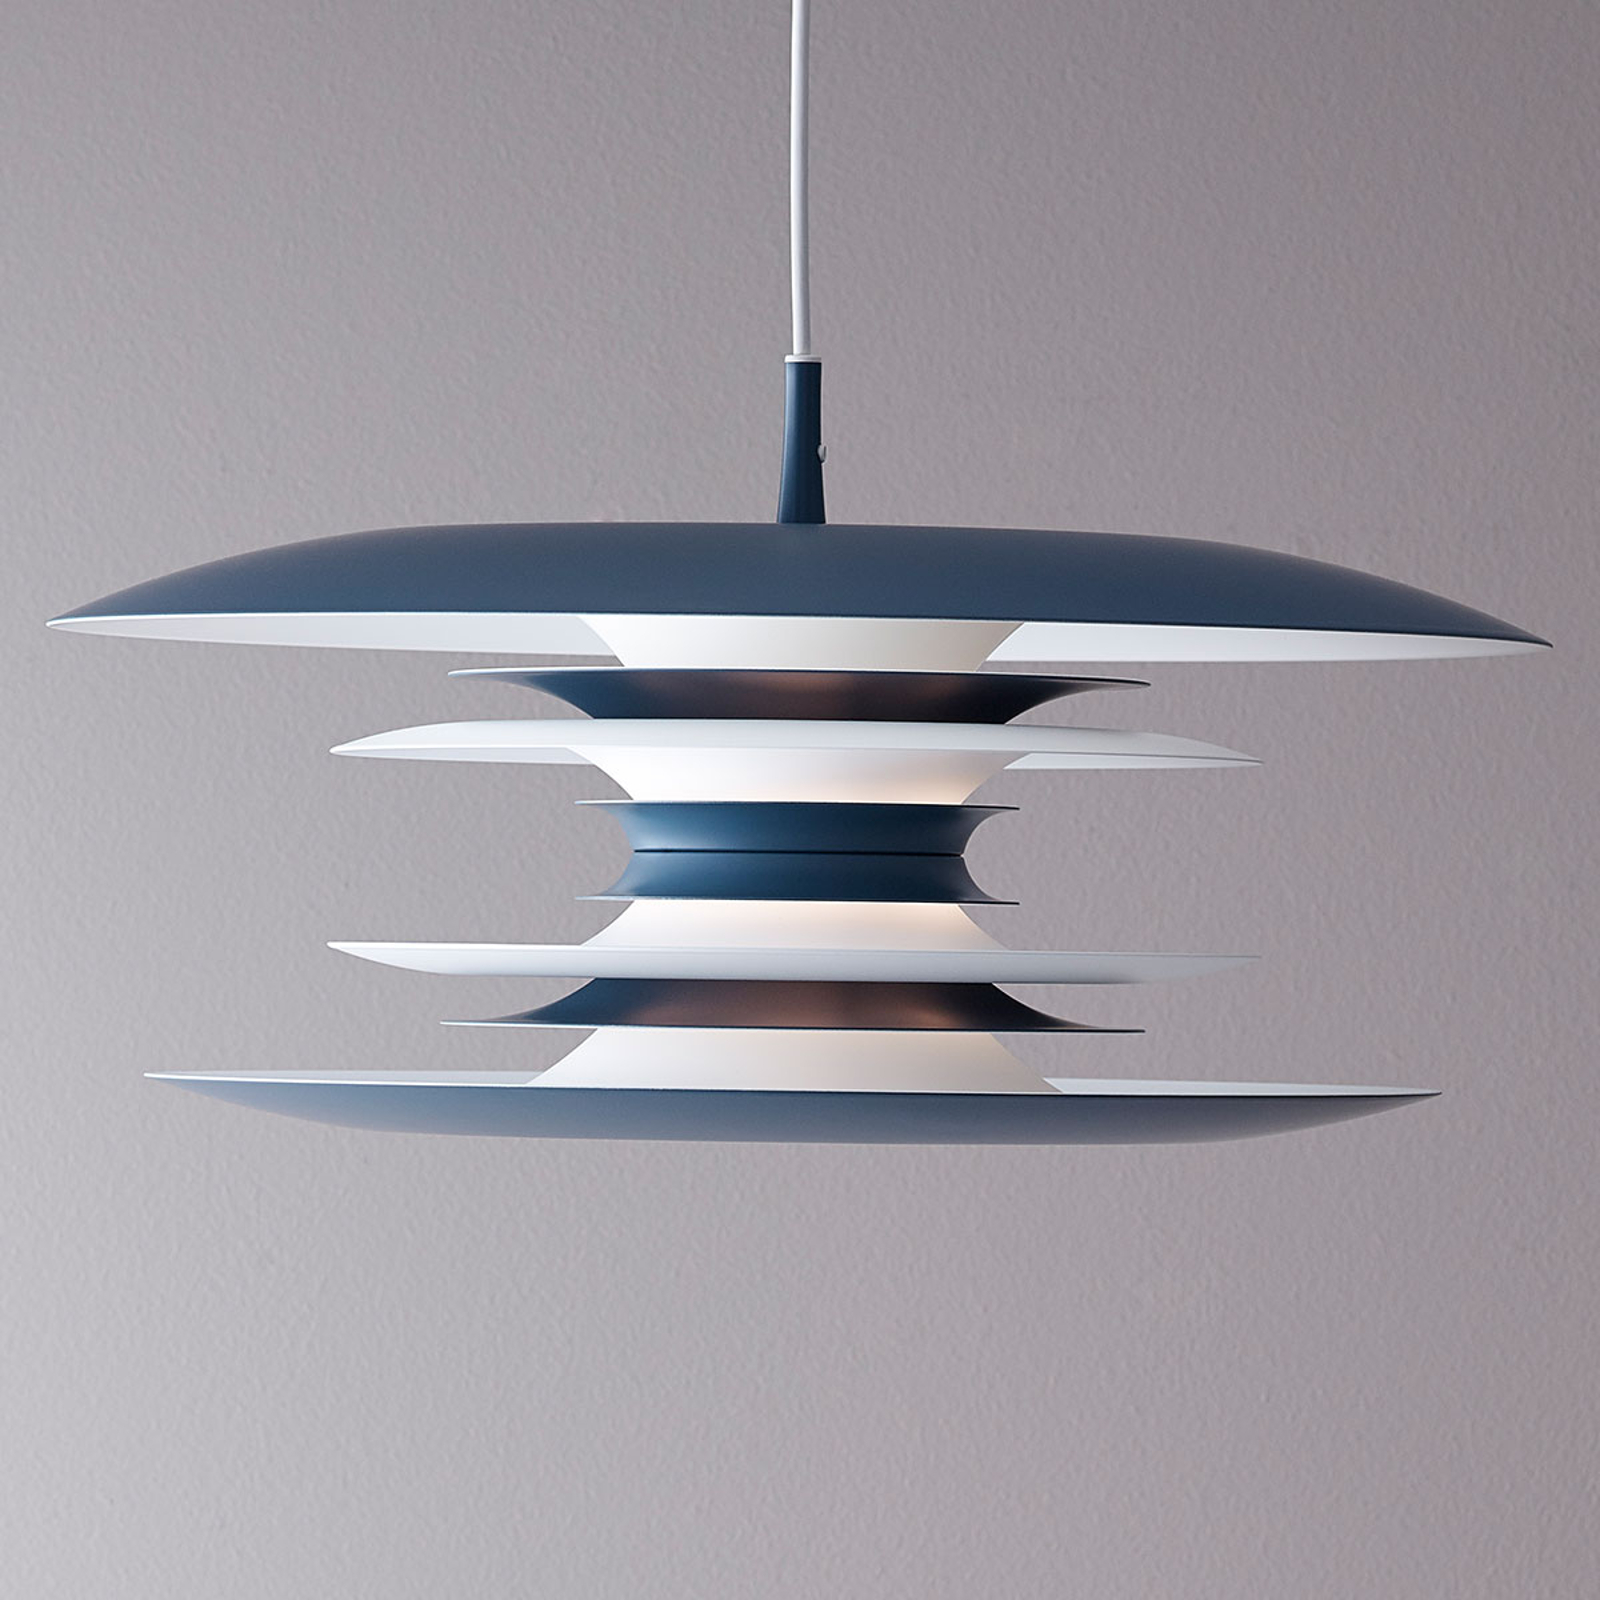 Lampa wisząca Diablo Ø 50 cm błękitna